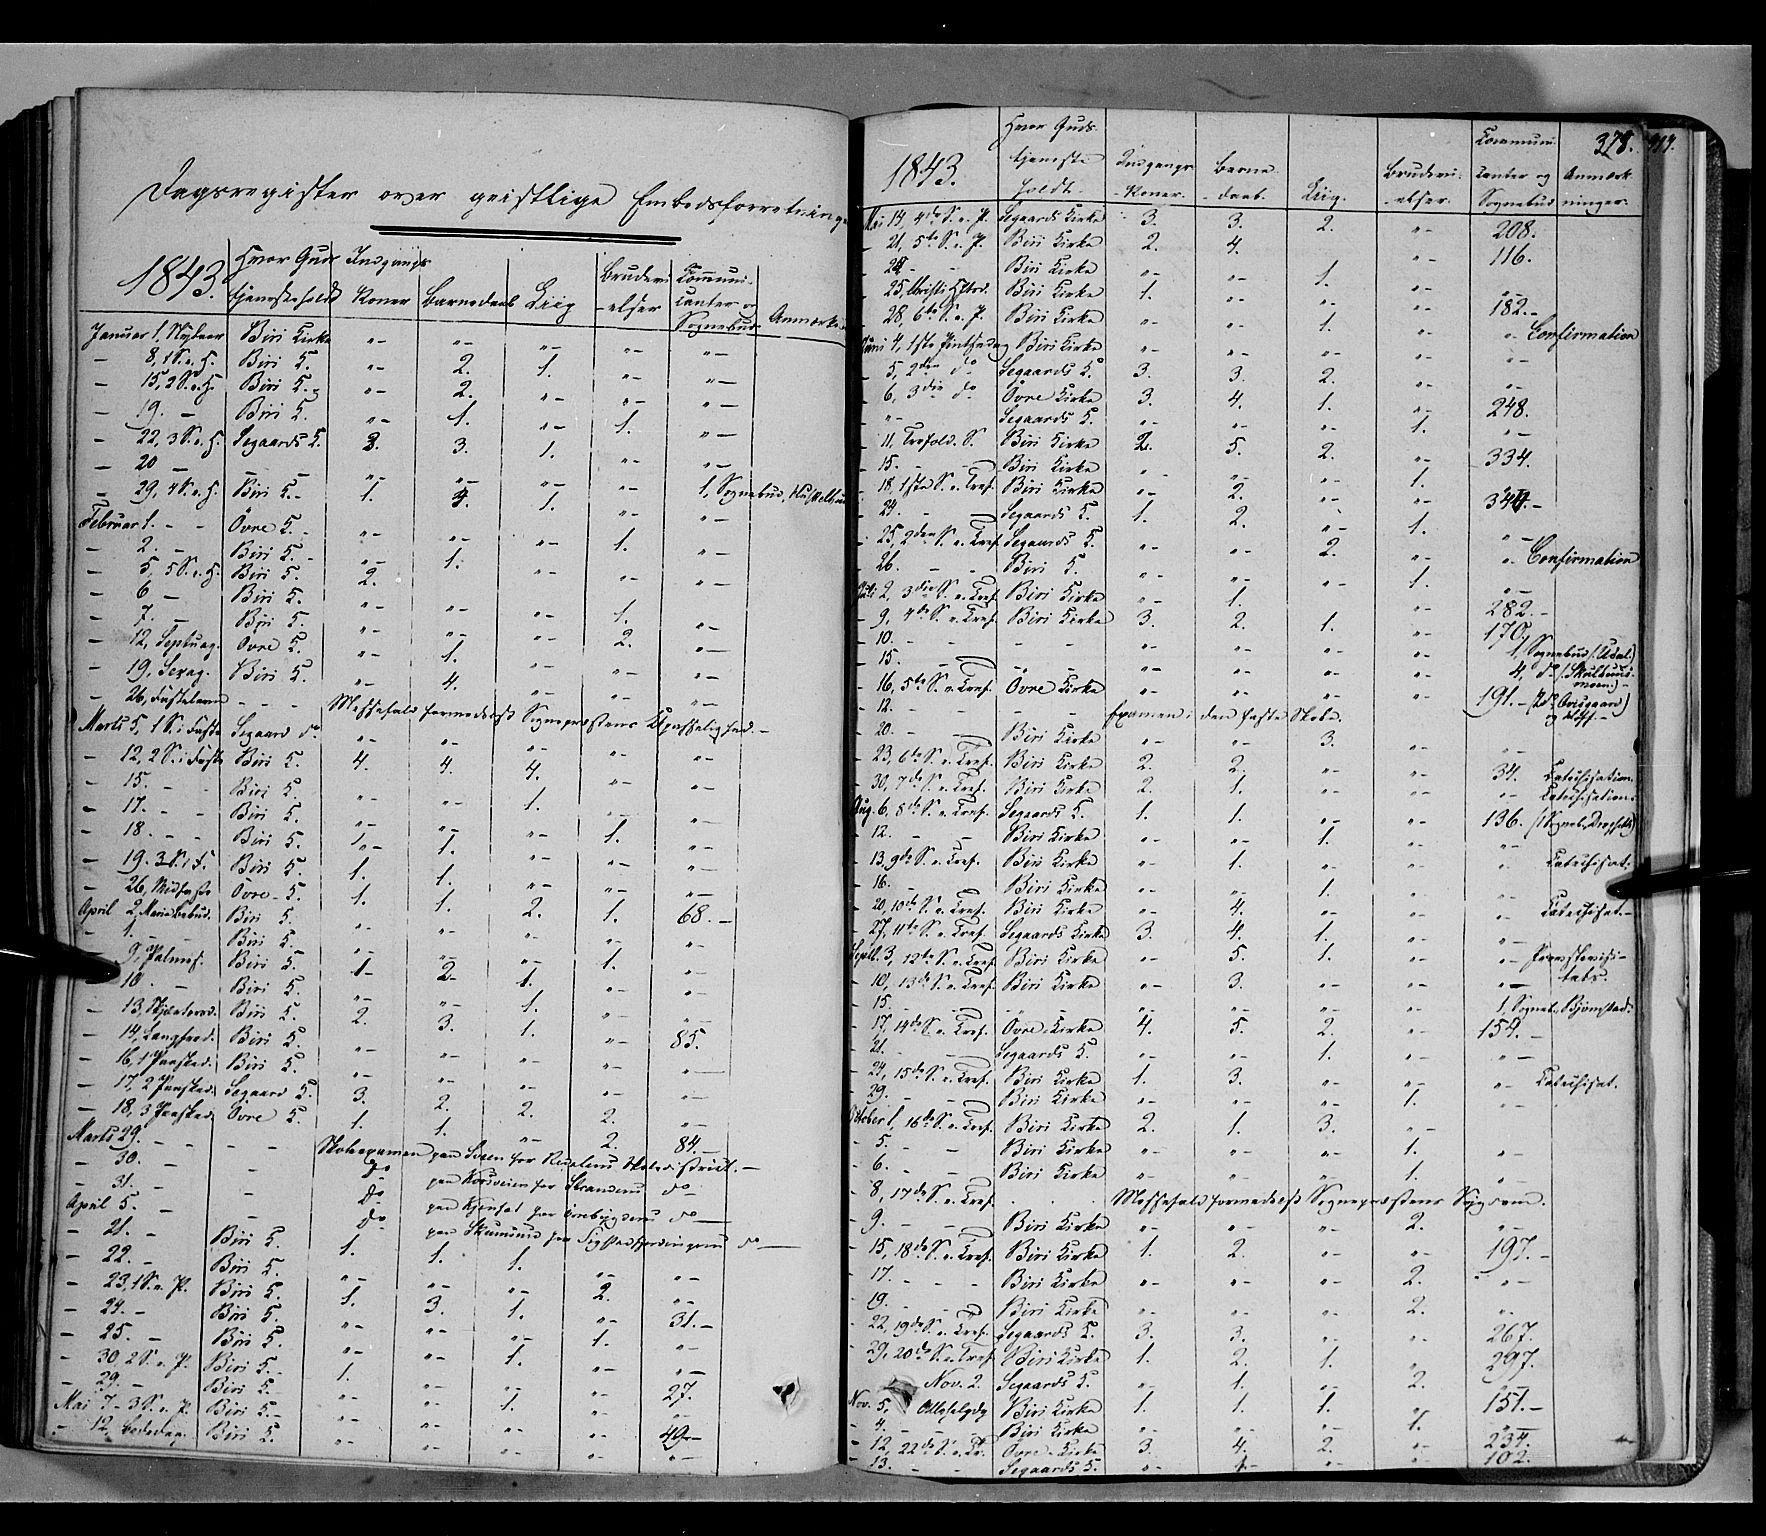 SAH, Biri prestekontor, Ministerialbok nr. 5, 1843-1854, s. 378